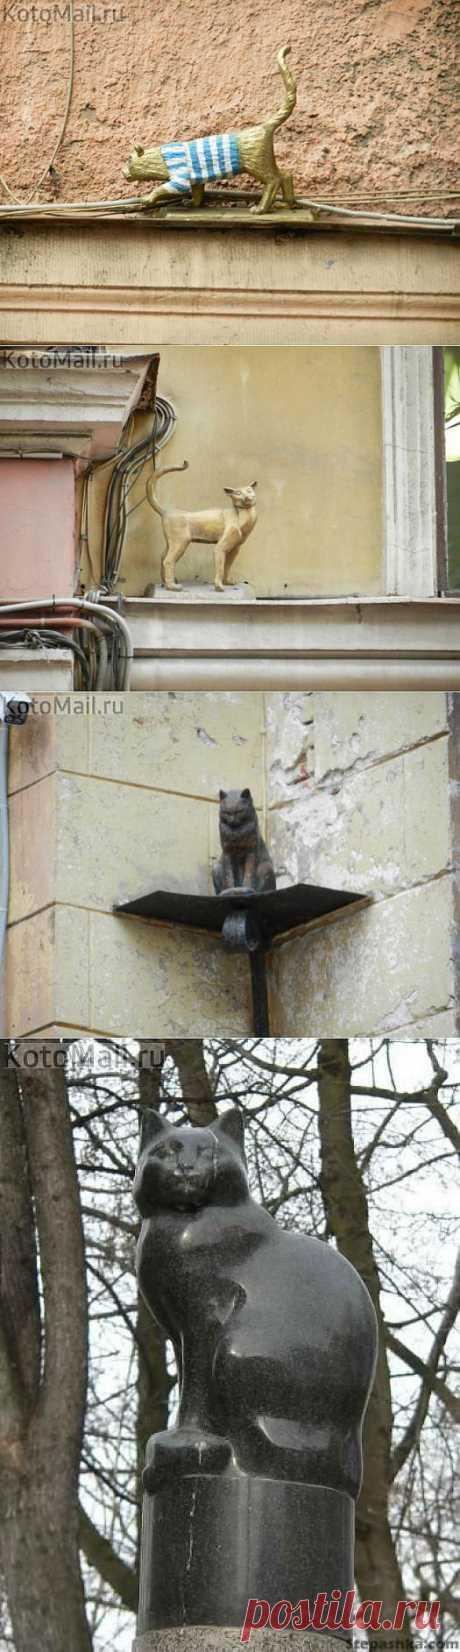 Питерские кошки | KotoMail.ru